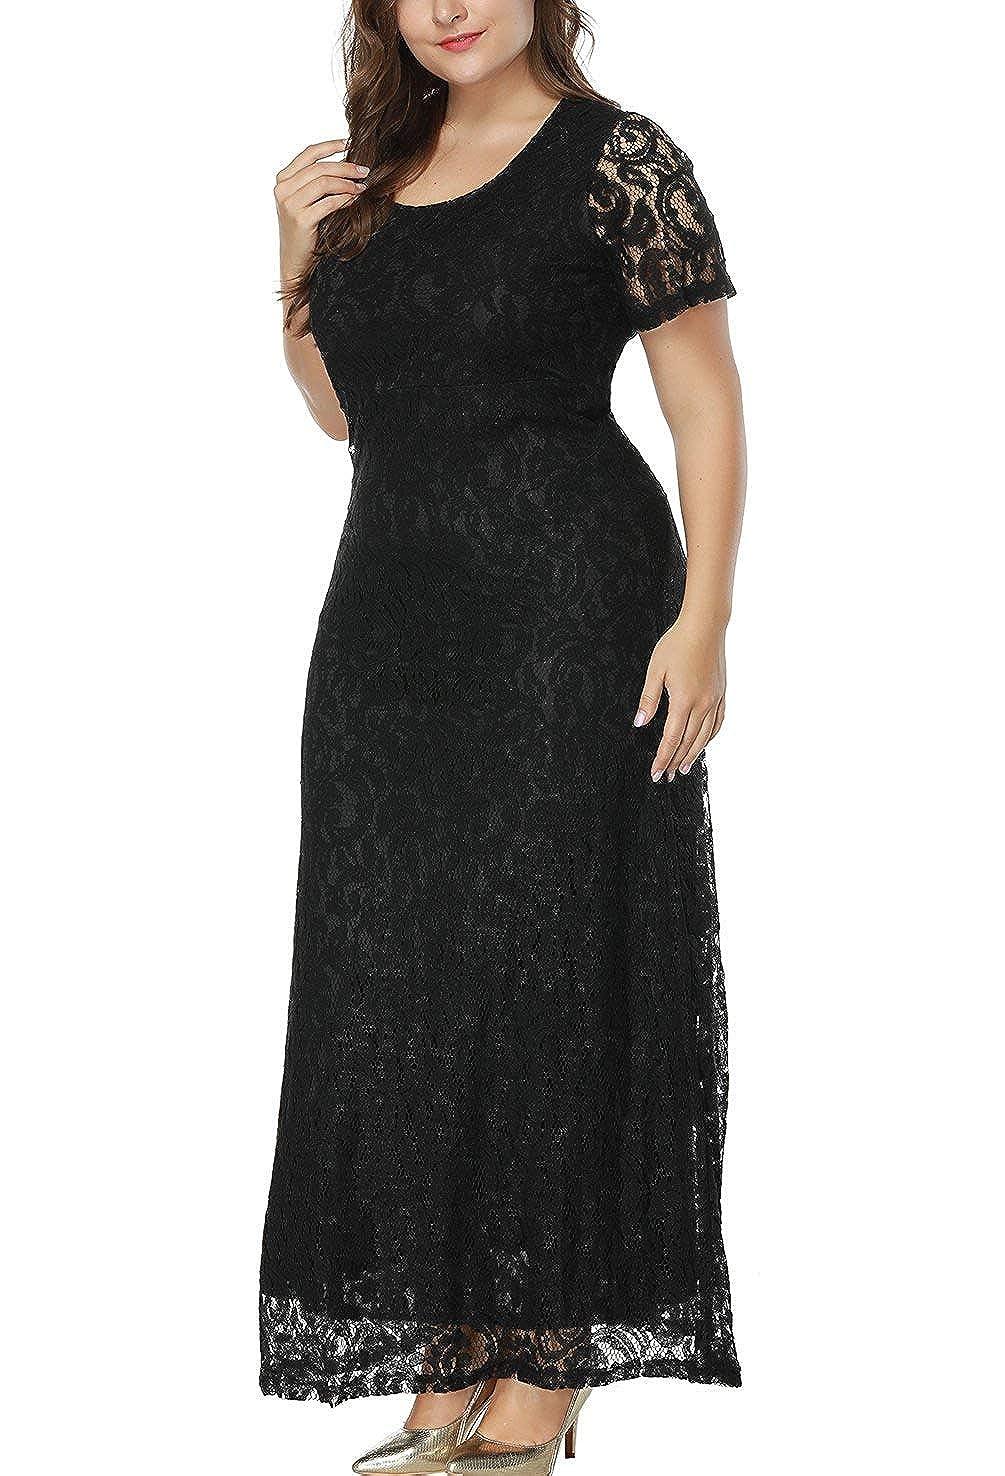 Erosebridal Women Plus Size Prom Dresses Floral Lace Mother of The Bride  Evening Gown